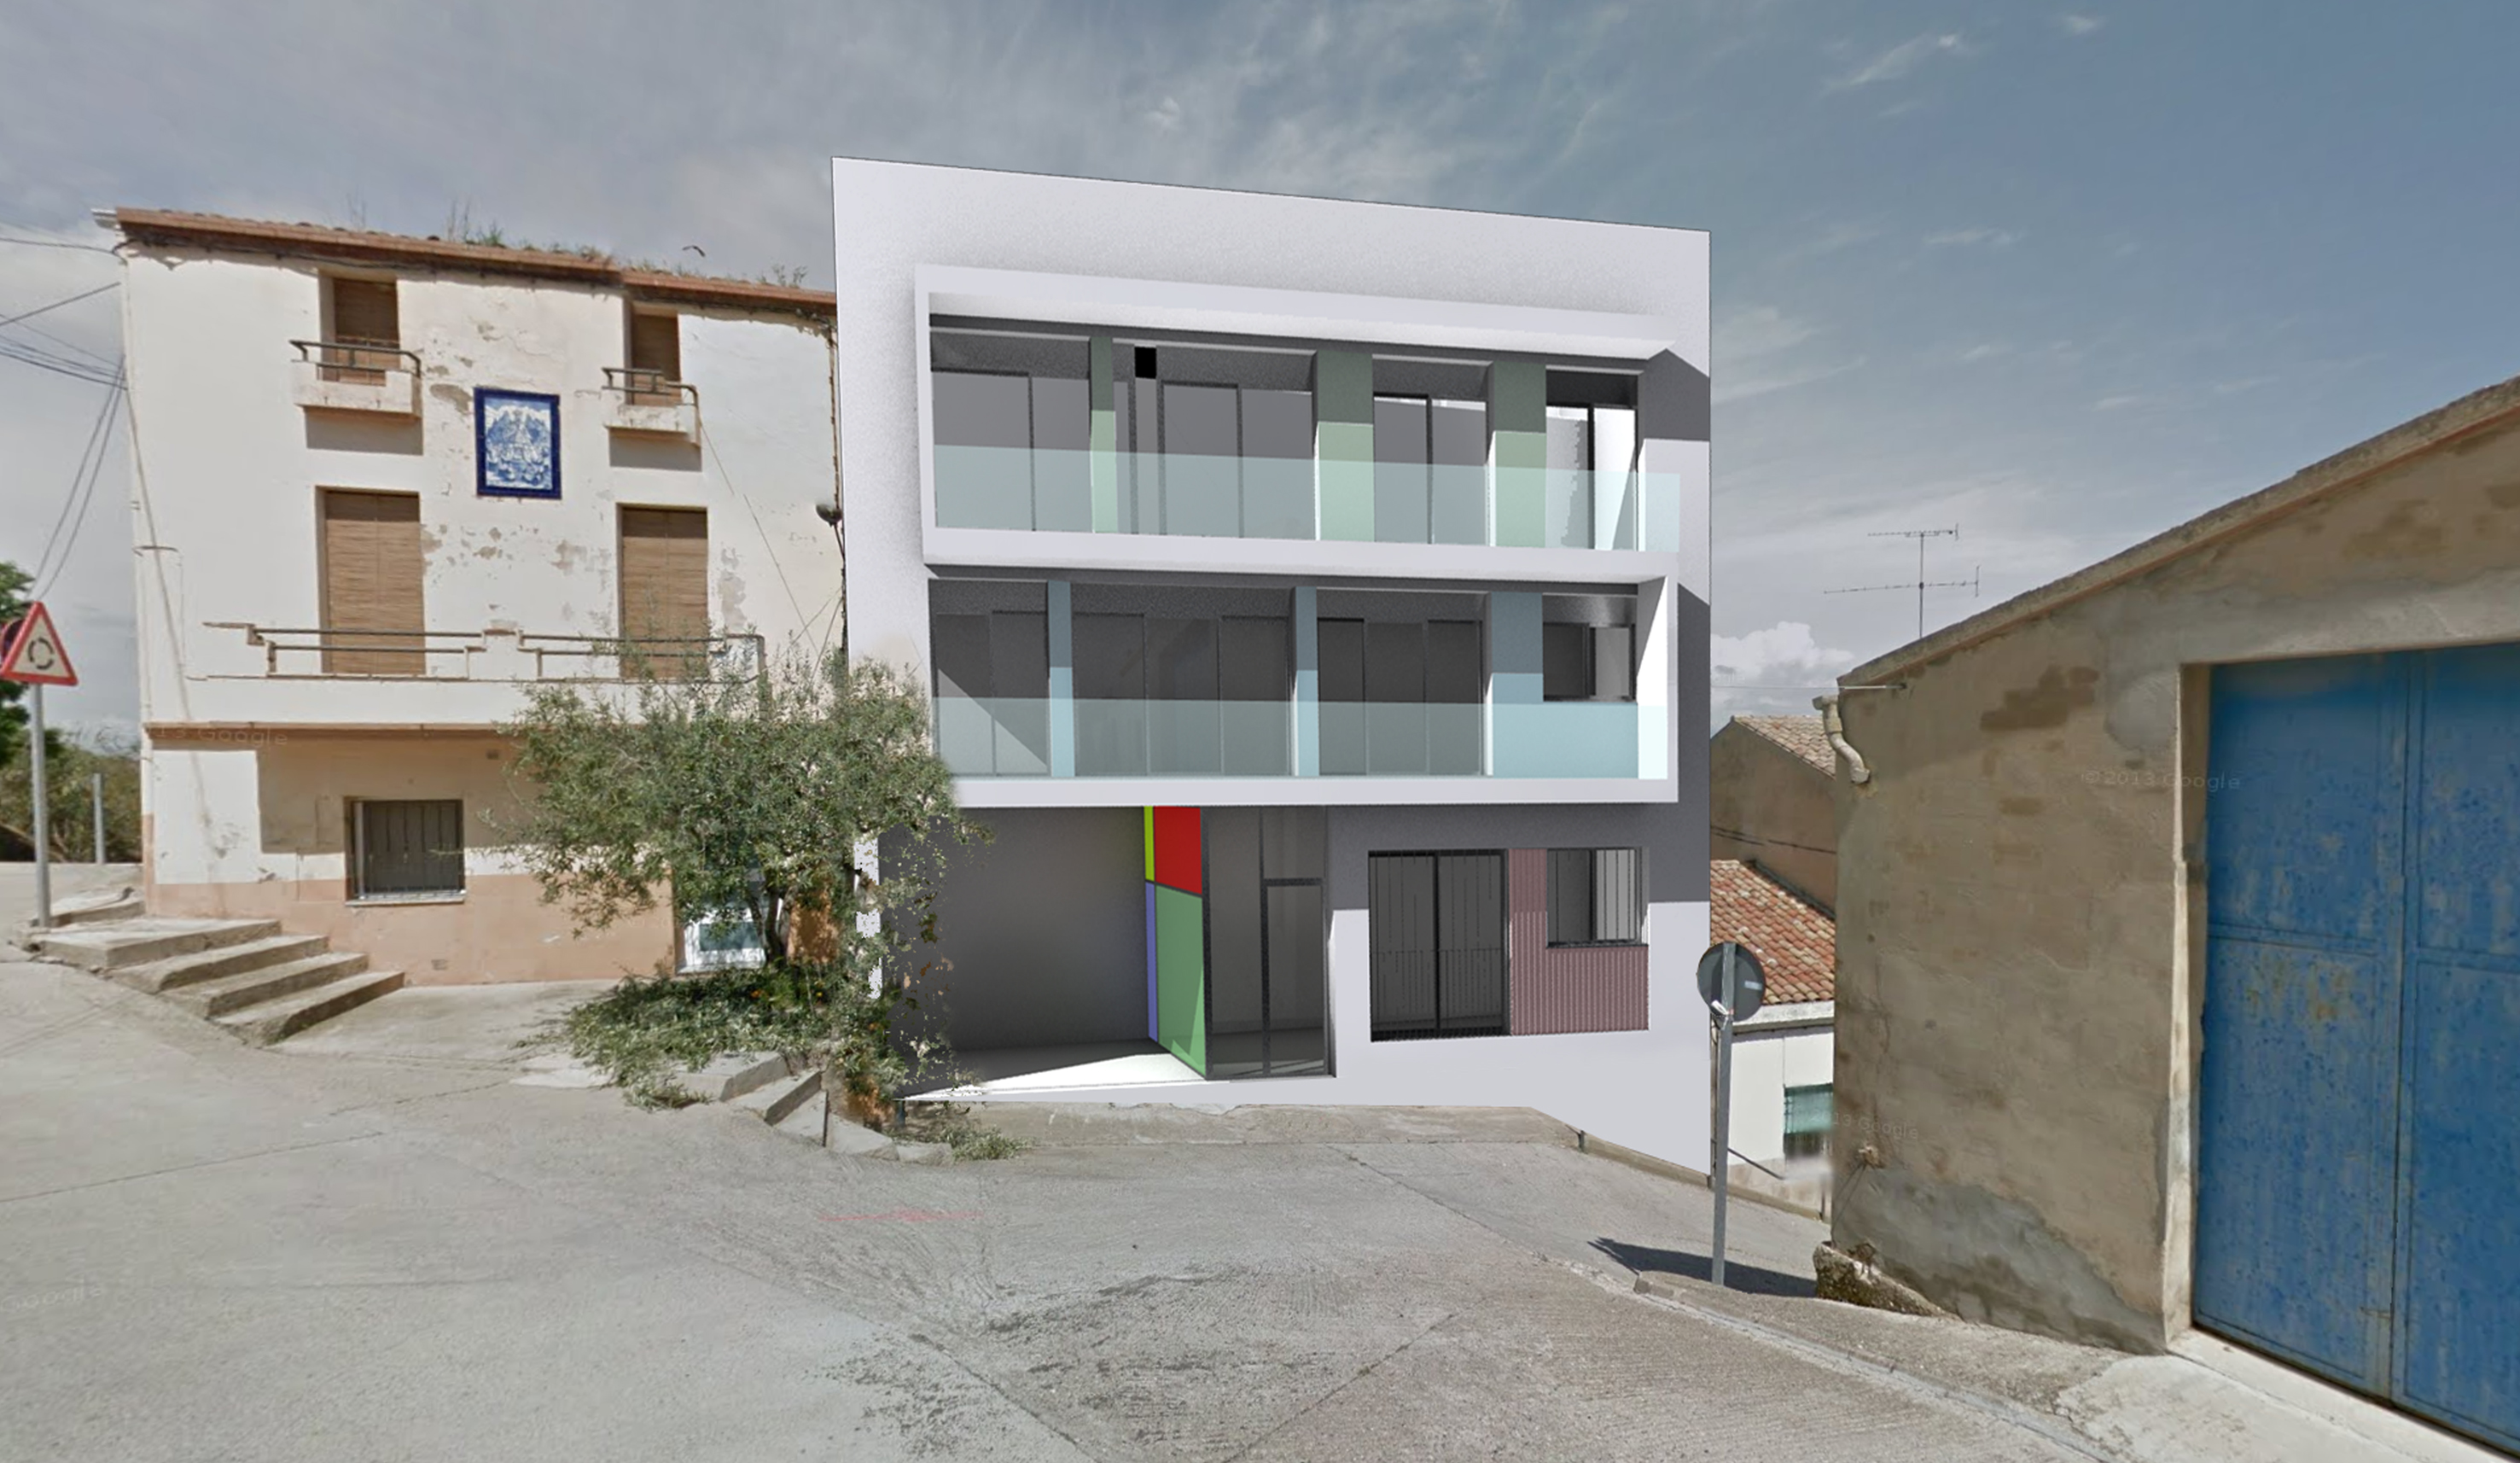 EDIFICIO PLURIFAMILIAR MIRALCAMP - Despacho de Arquitectura - Arquitecto Miralcamp